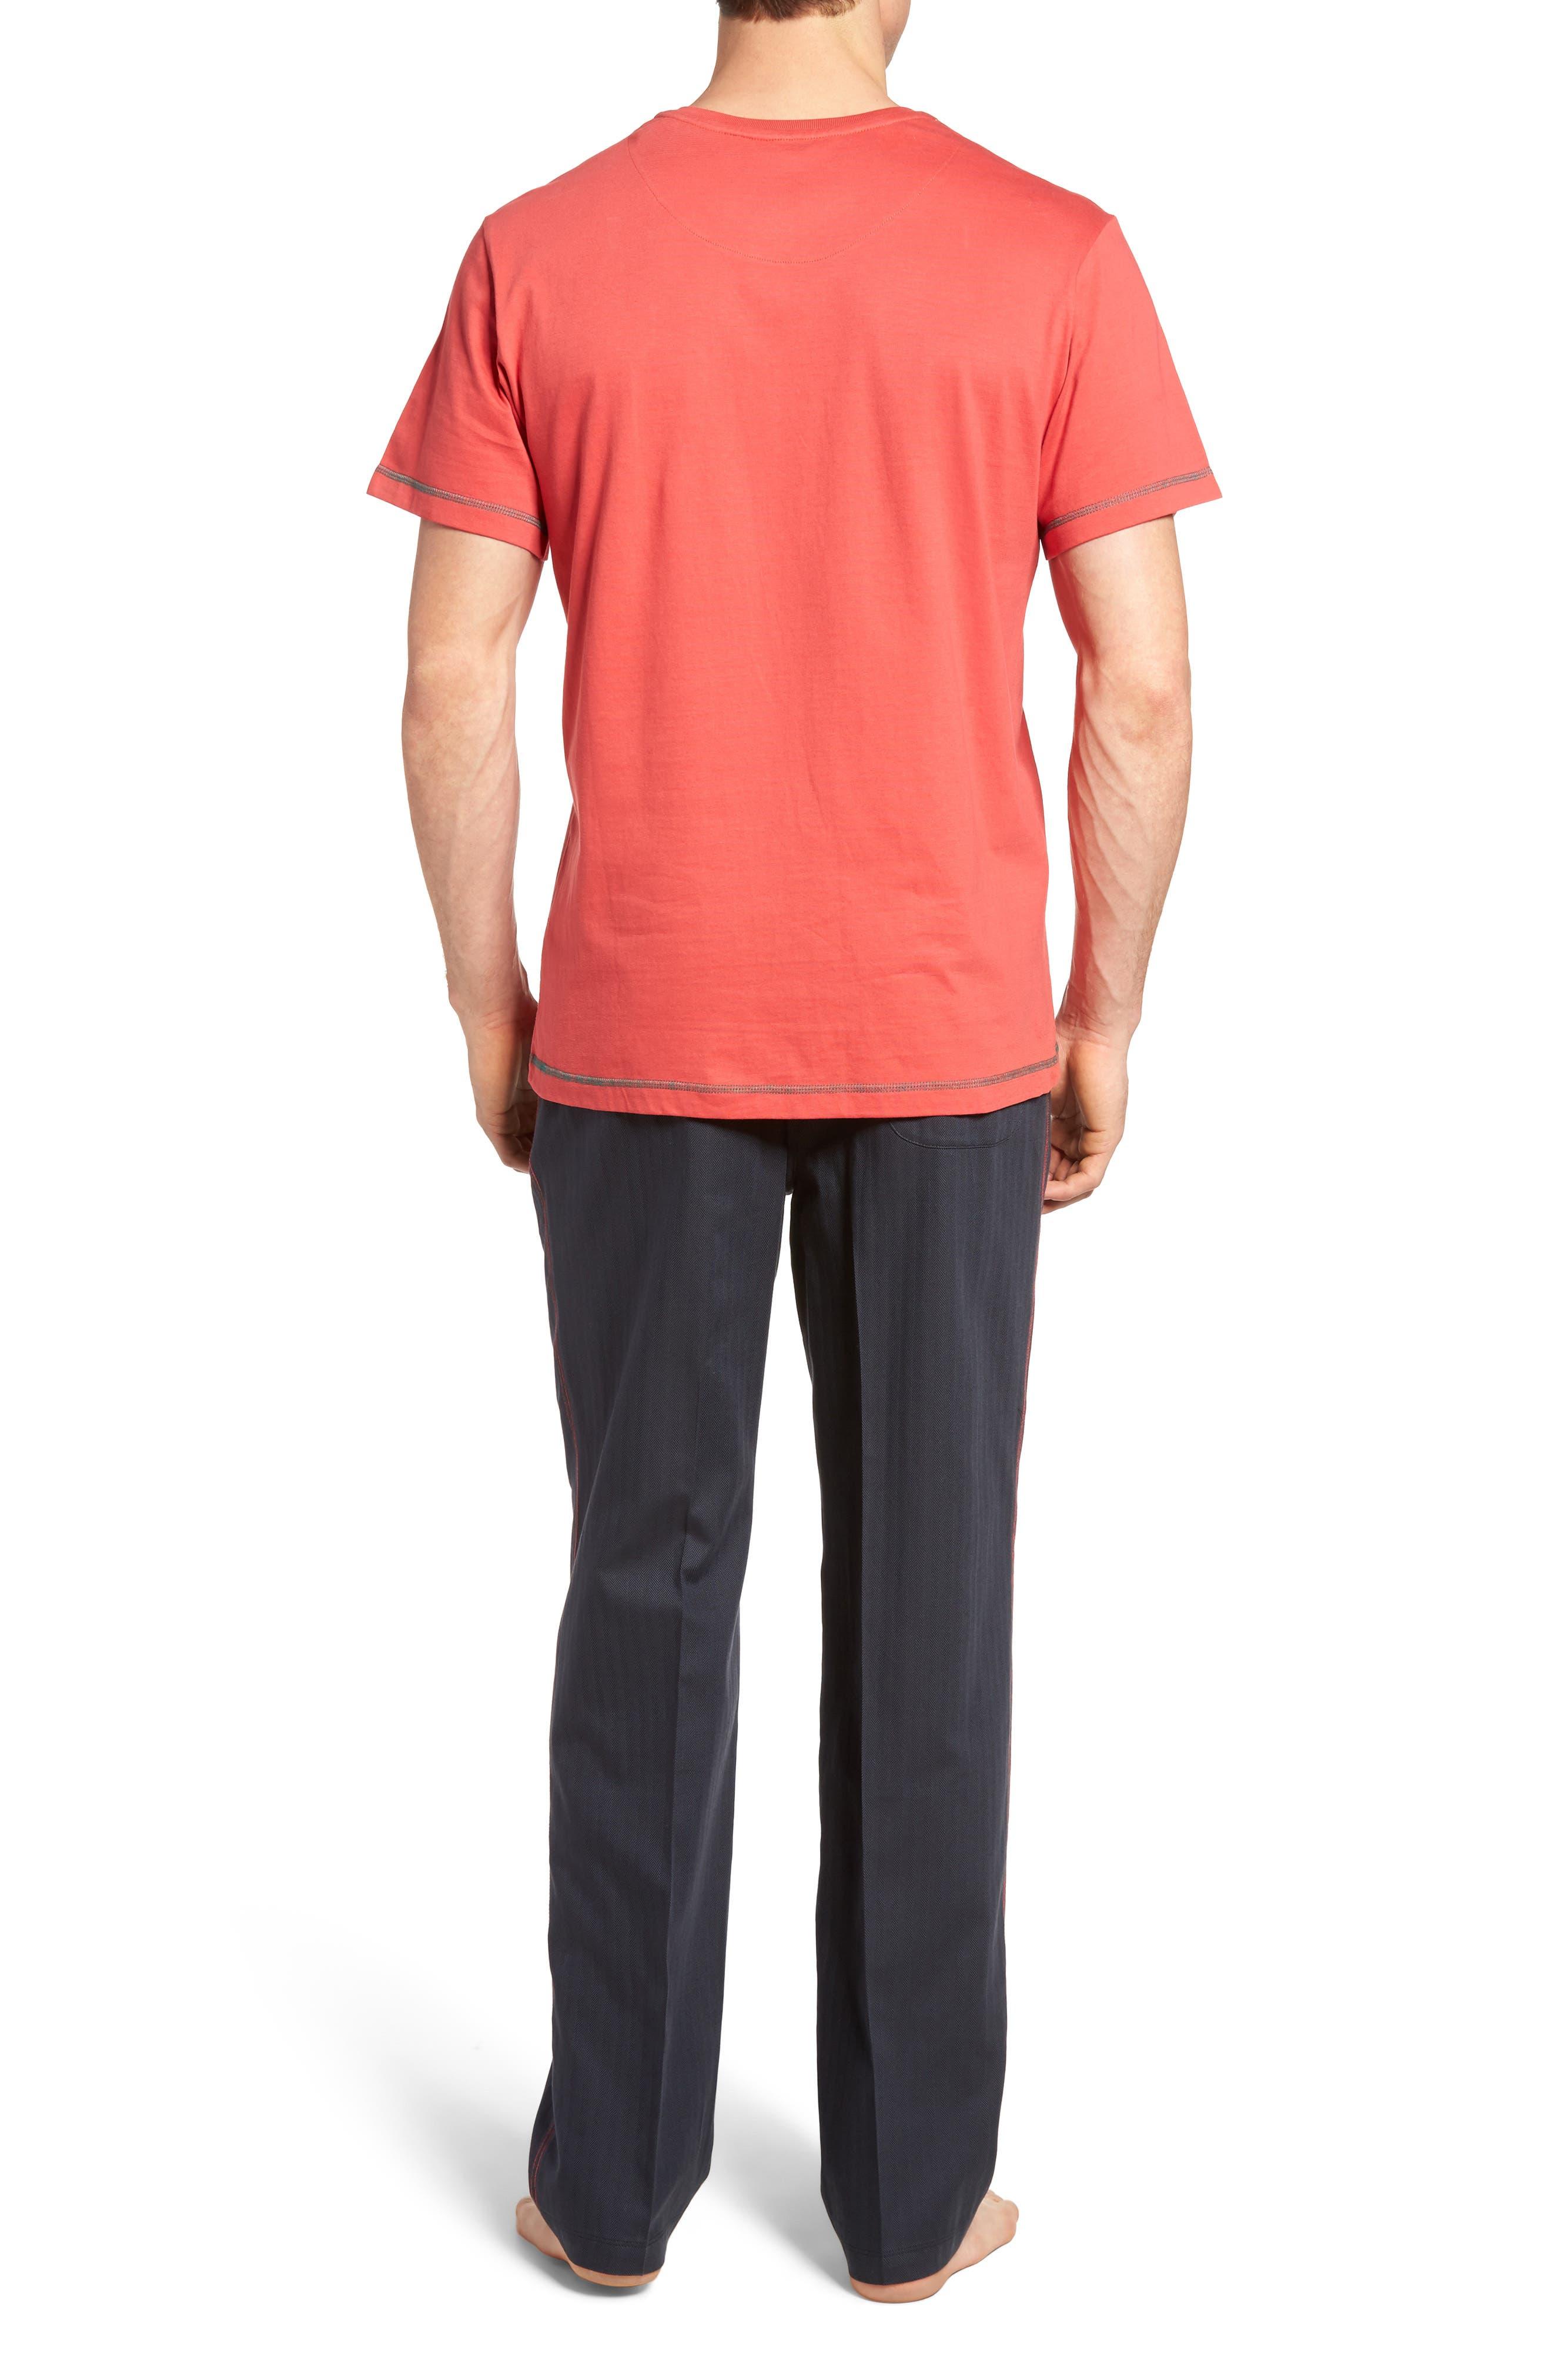 Fusion Pajama Set,                             Alternate thumbnail 2, color,                             Red/ Lead